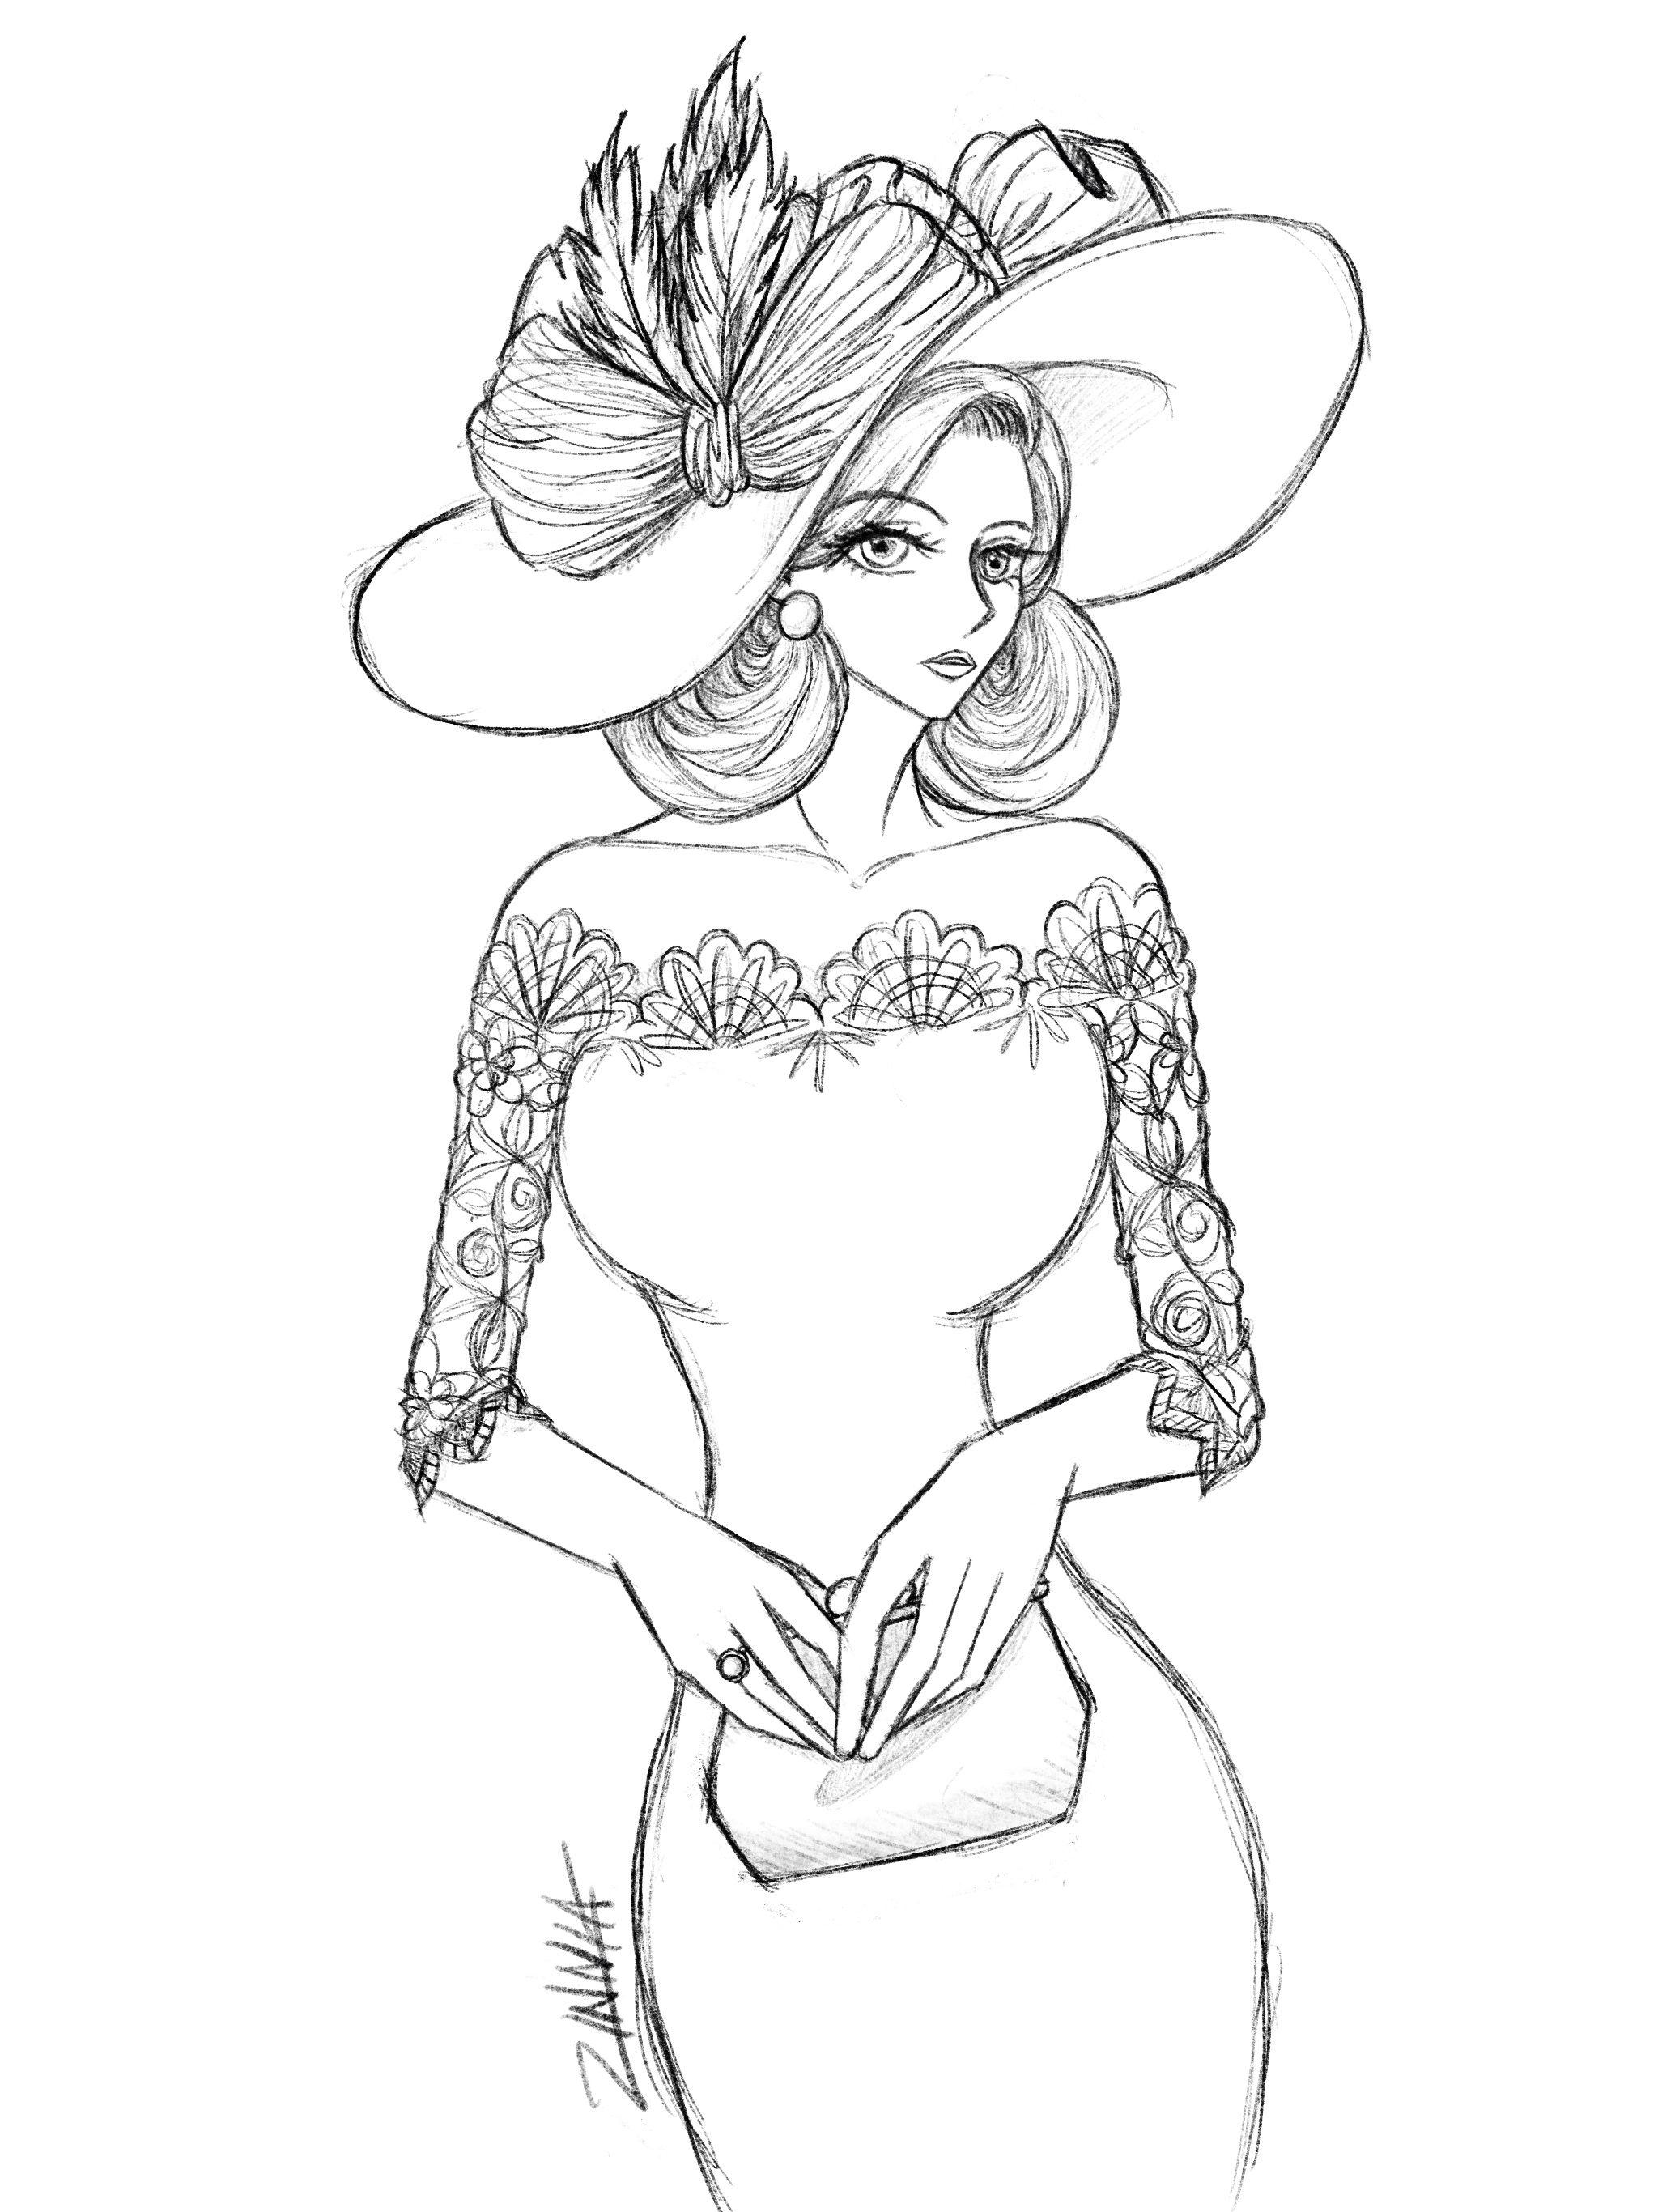 Sketch using iPad Pro Procreate app. Lady illustration